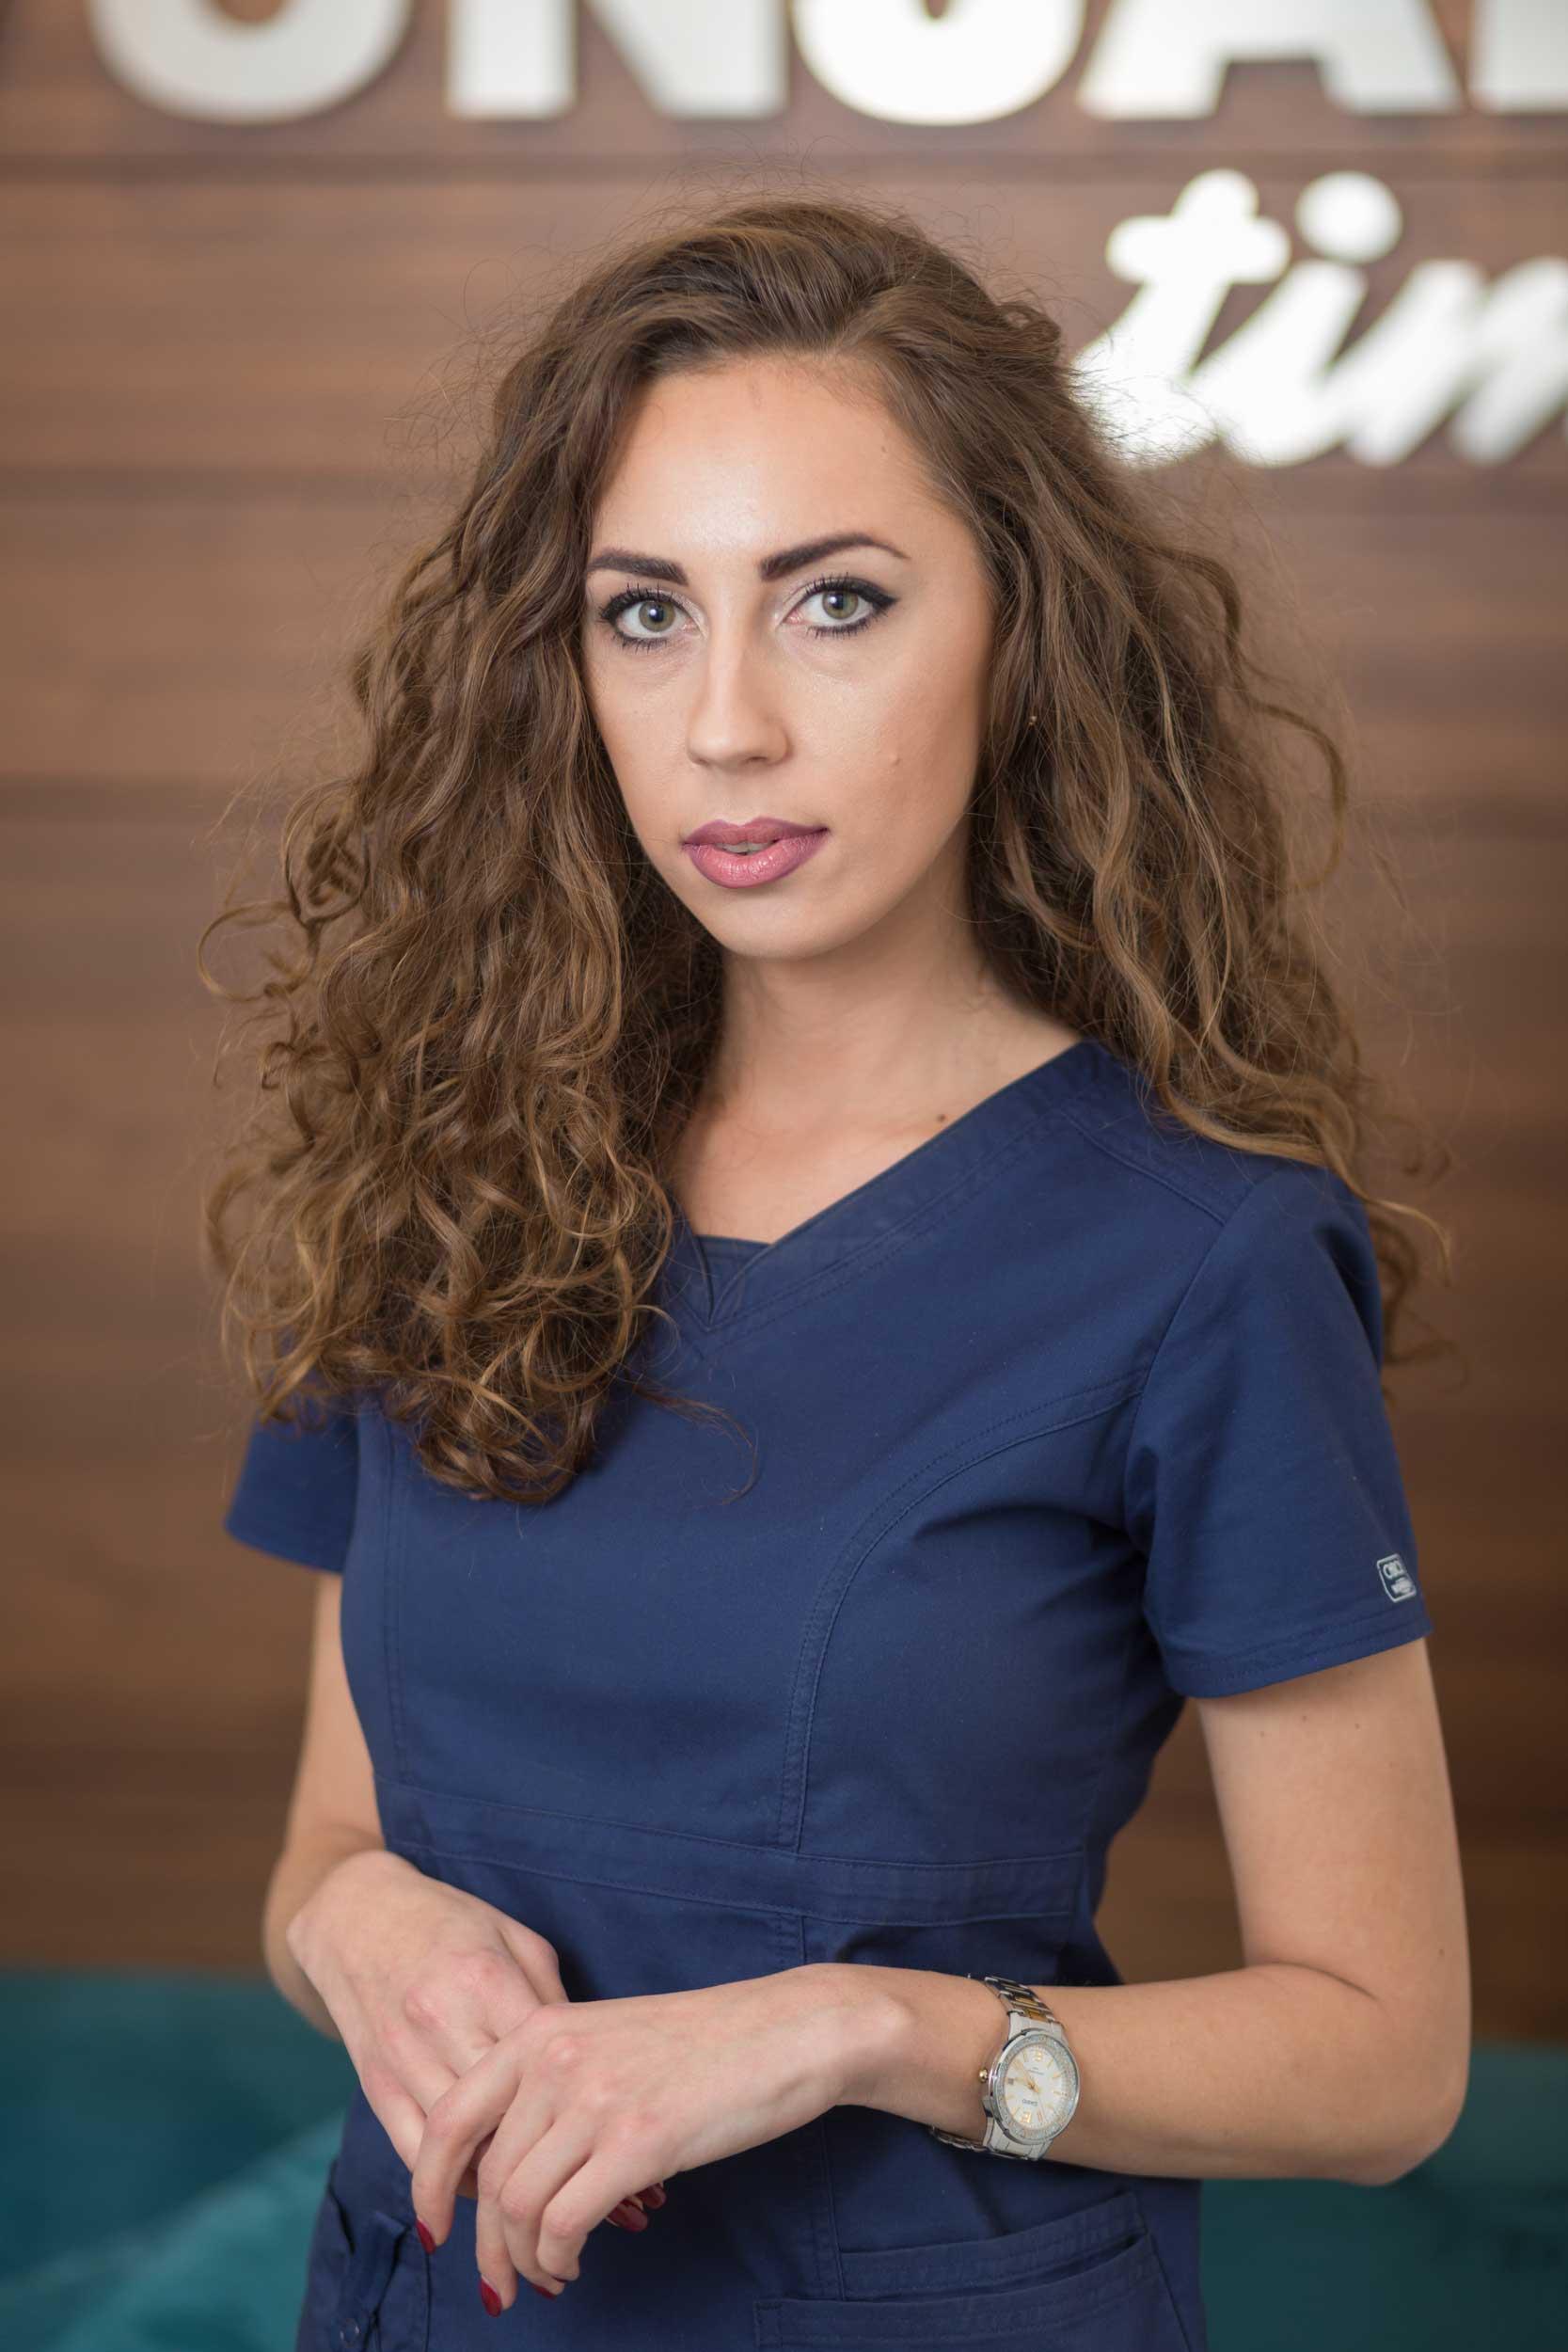 stomatoloska-ordinacija-vunjak-dental-clinic-sestra-jovana-andrejevic